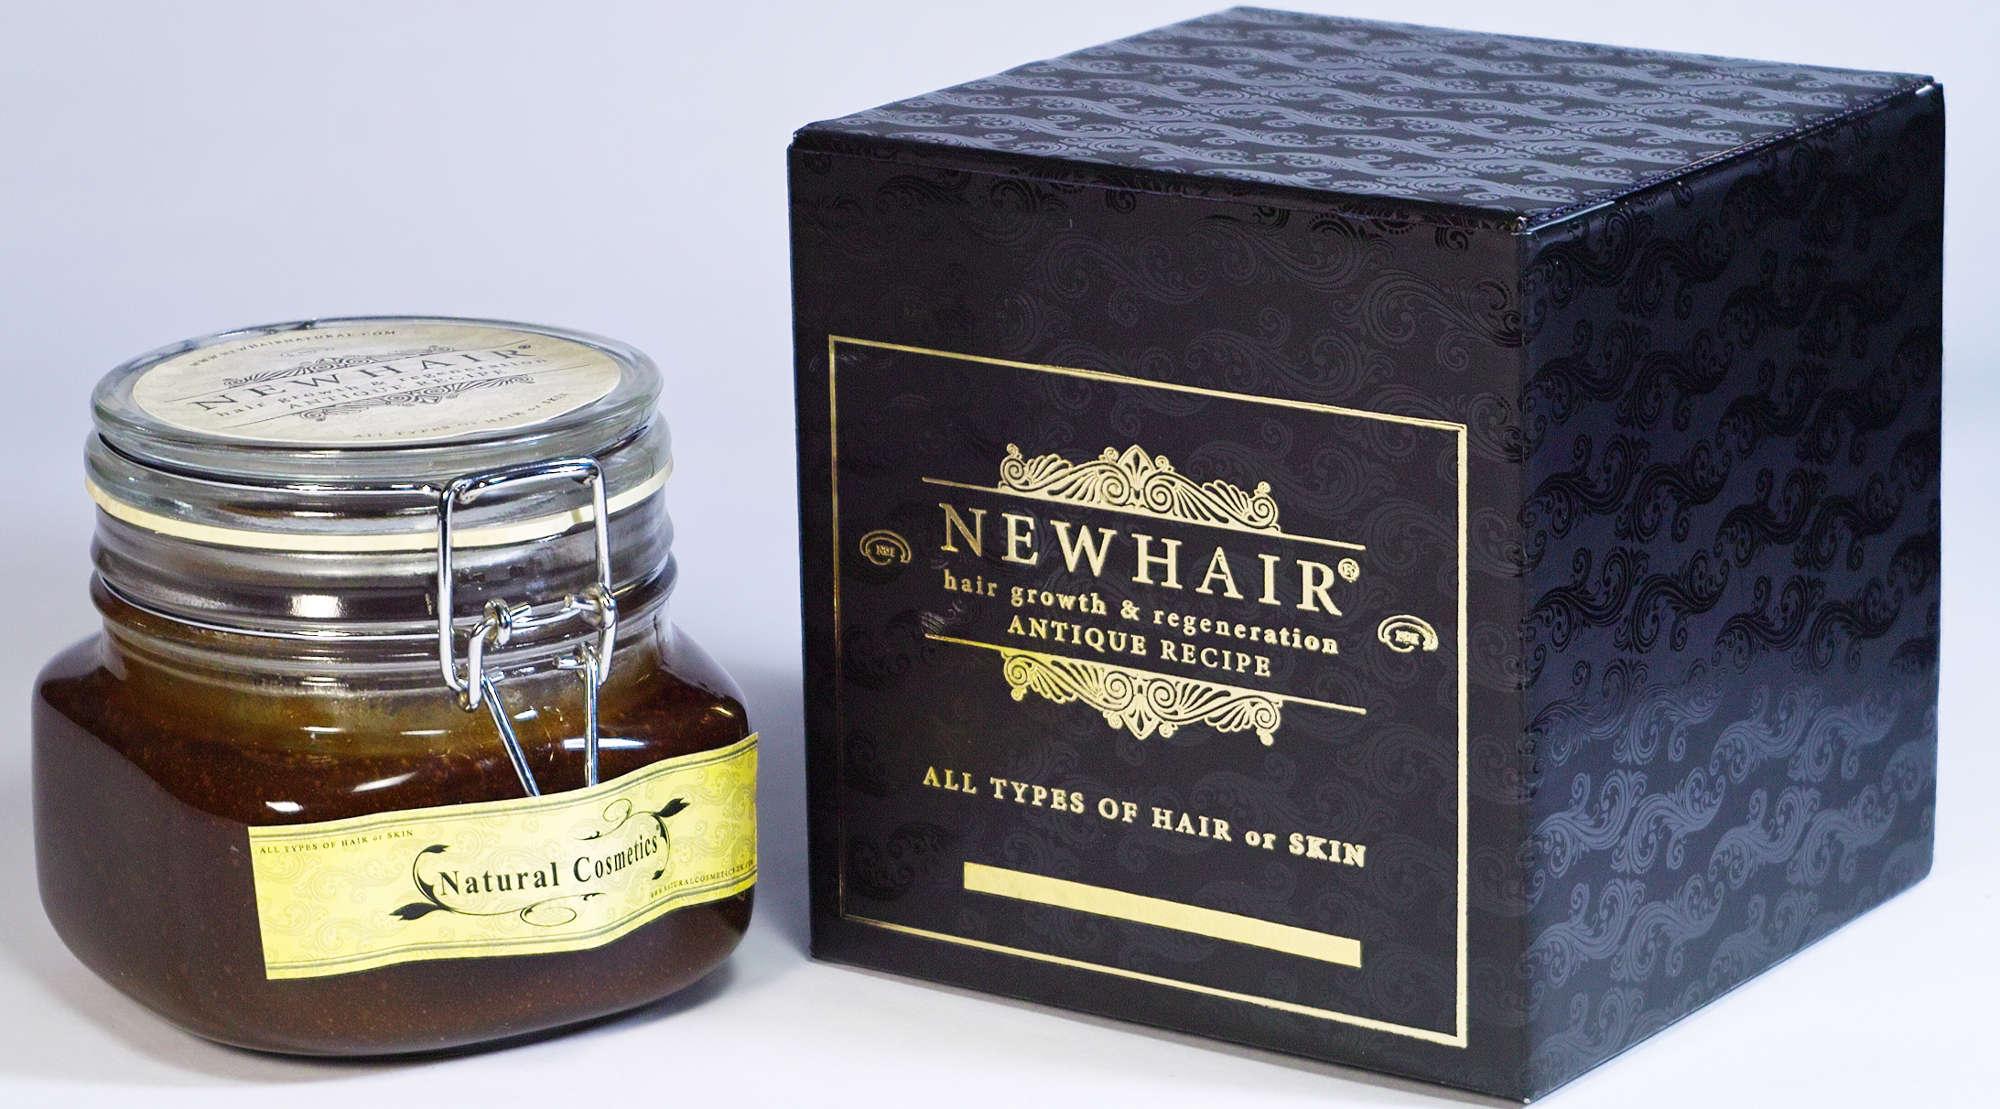 Tratamentul de păr Newhair